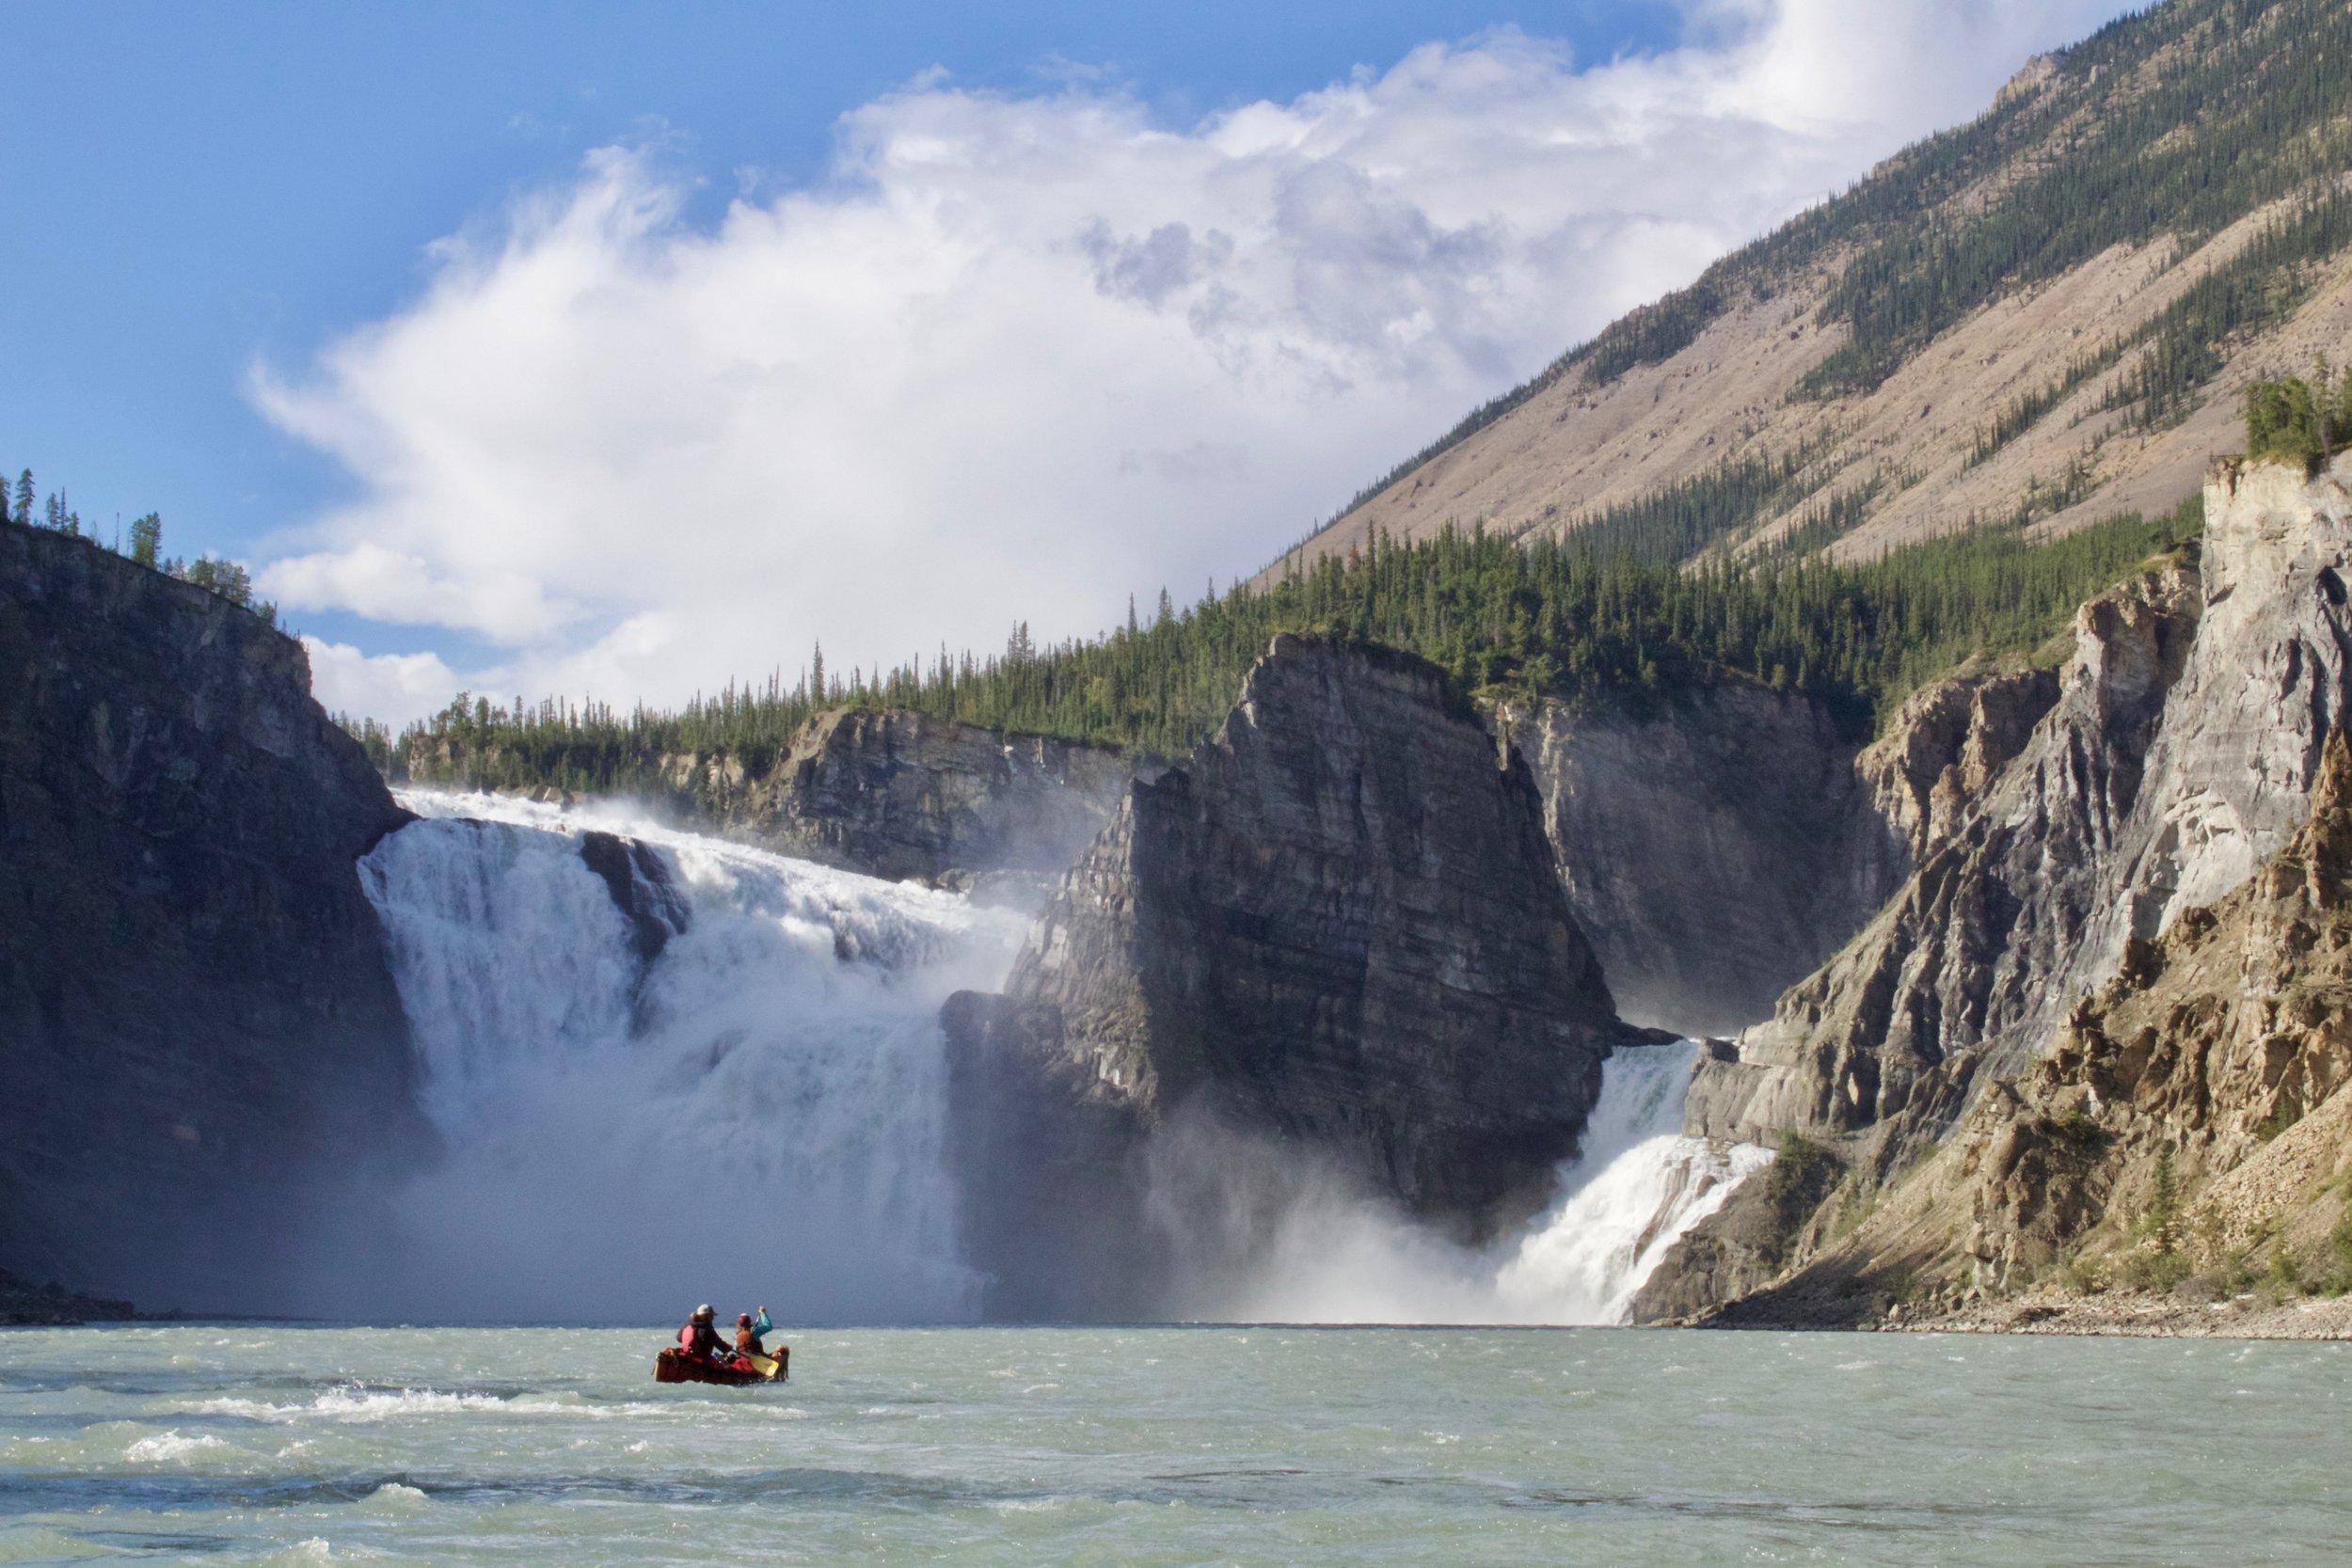 Guide Daniel Robb ferries out below Virginia Falls in a 17' Prospector Canoe.